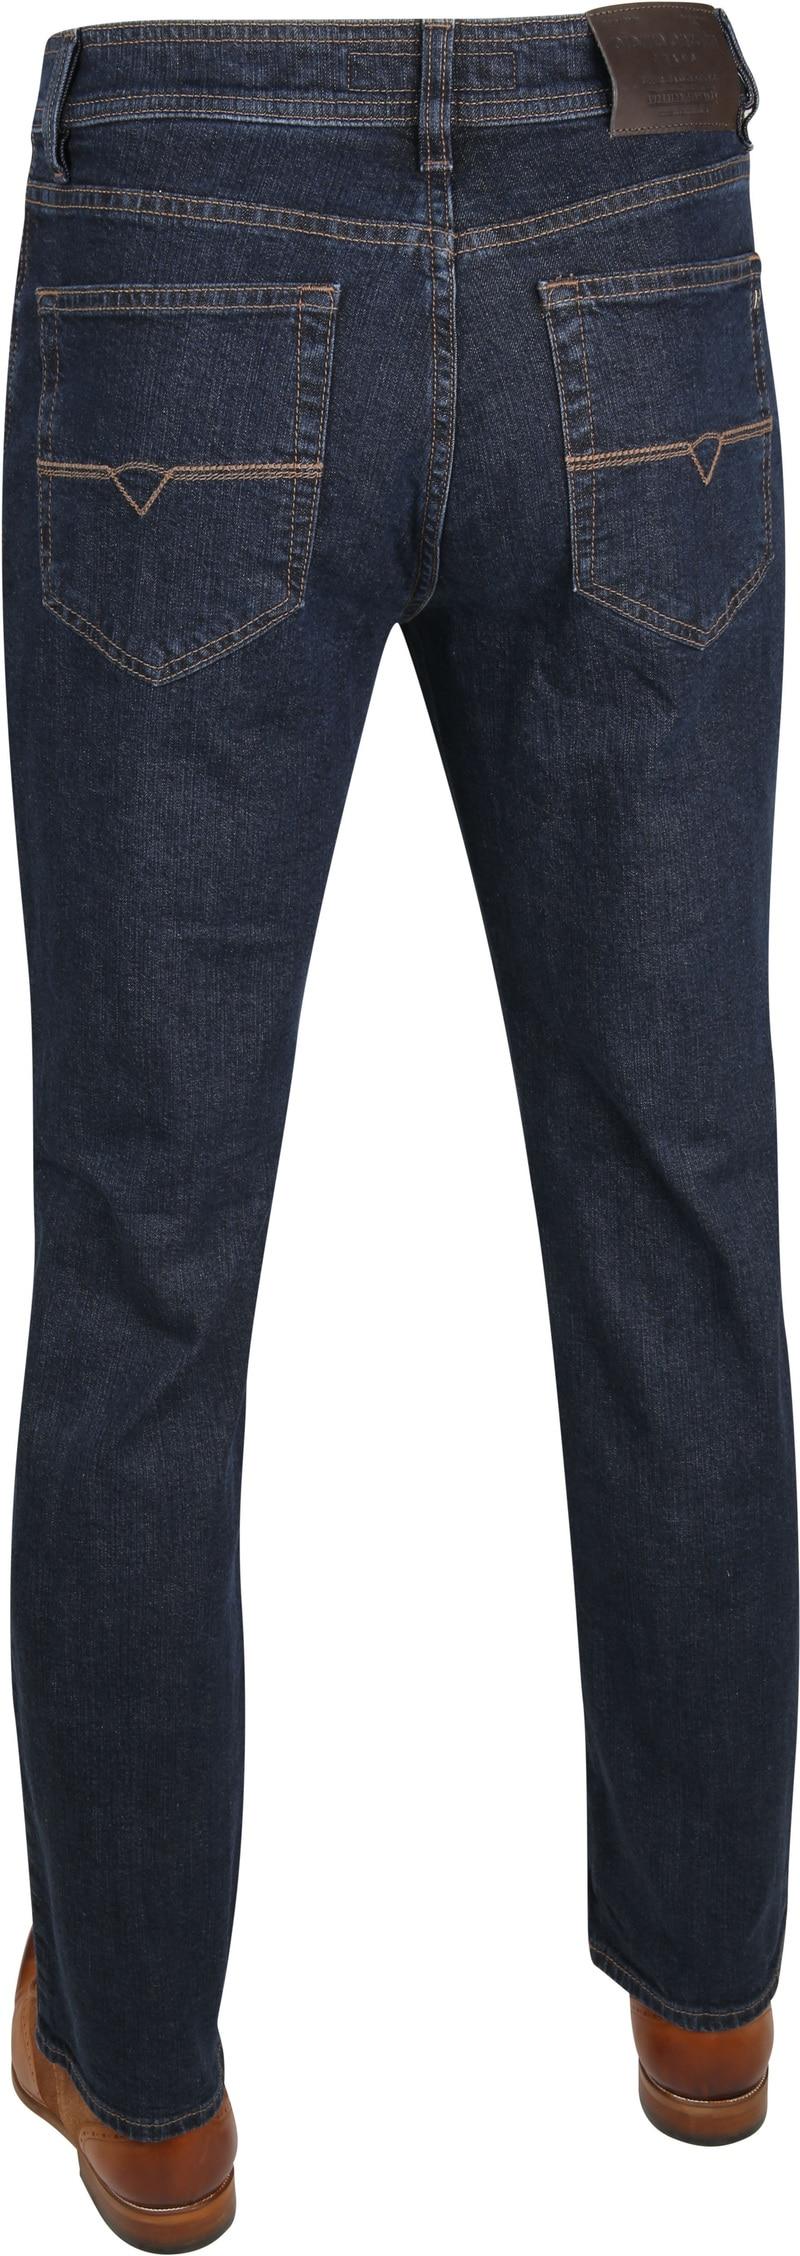 Pierre Cardin Jeans Dijon Navy photo 2